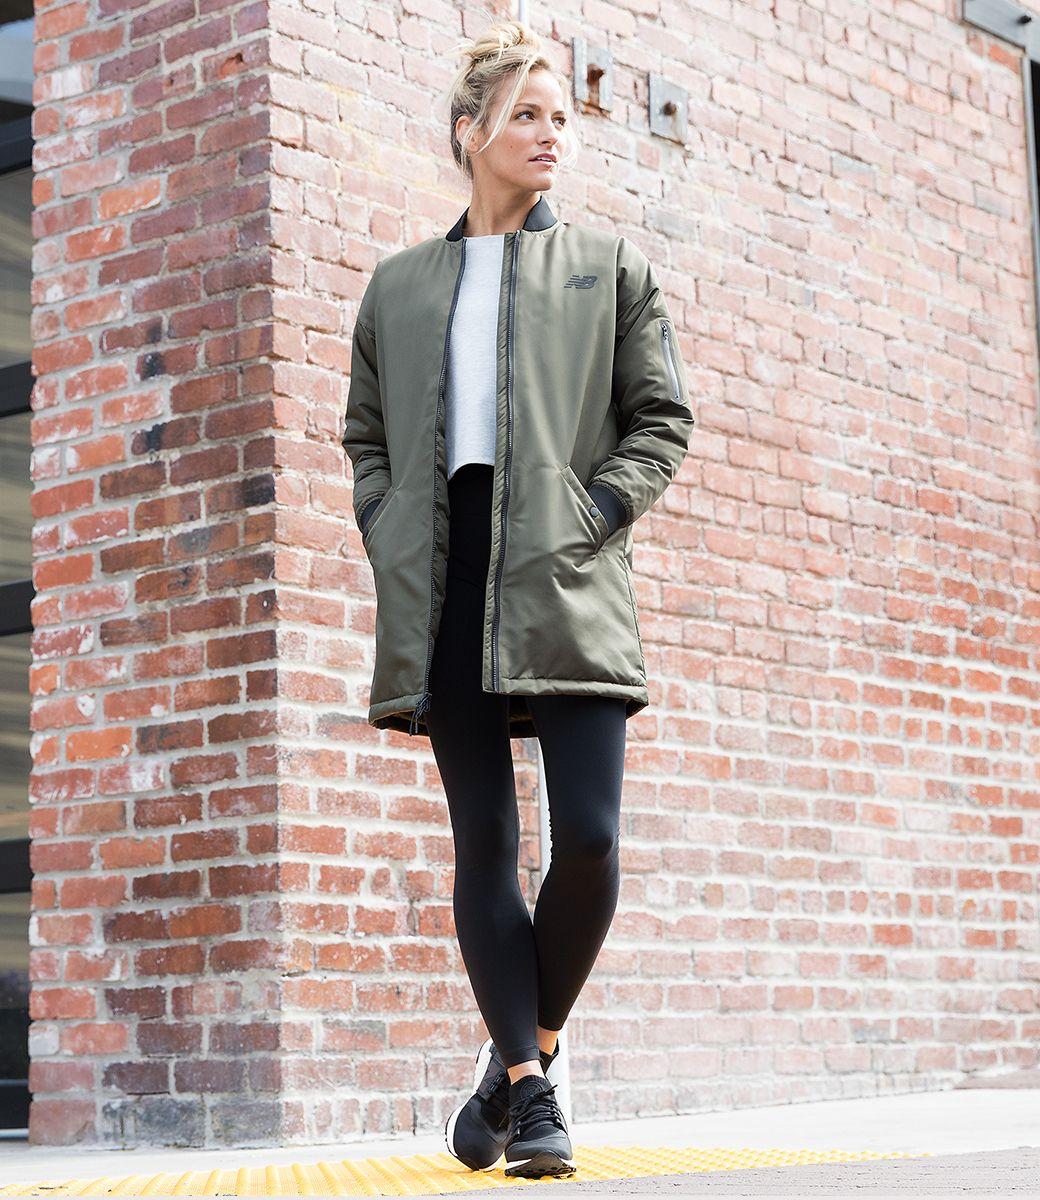 New Balance US Womens Chic Coverage,